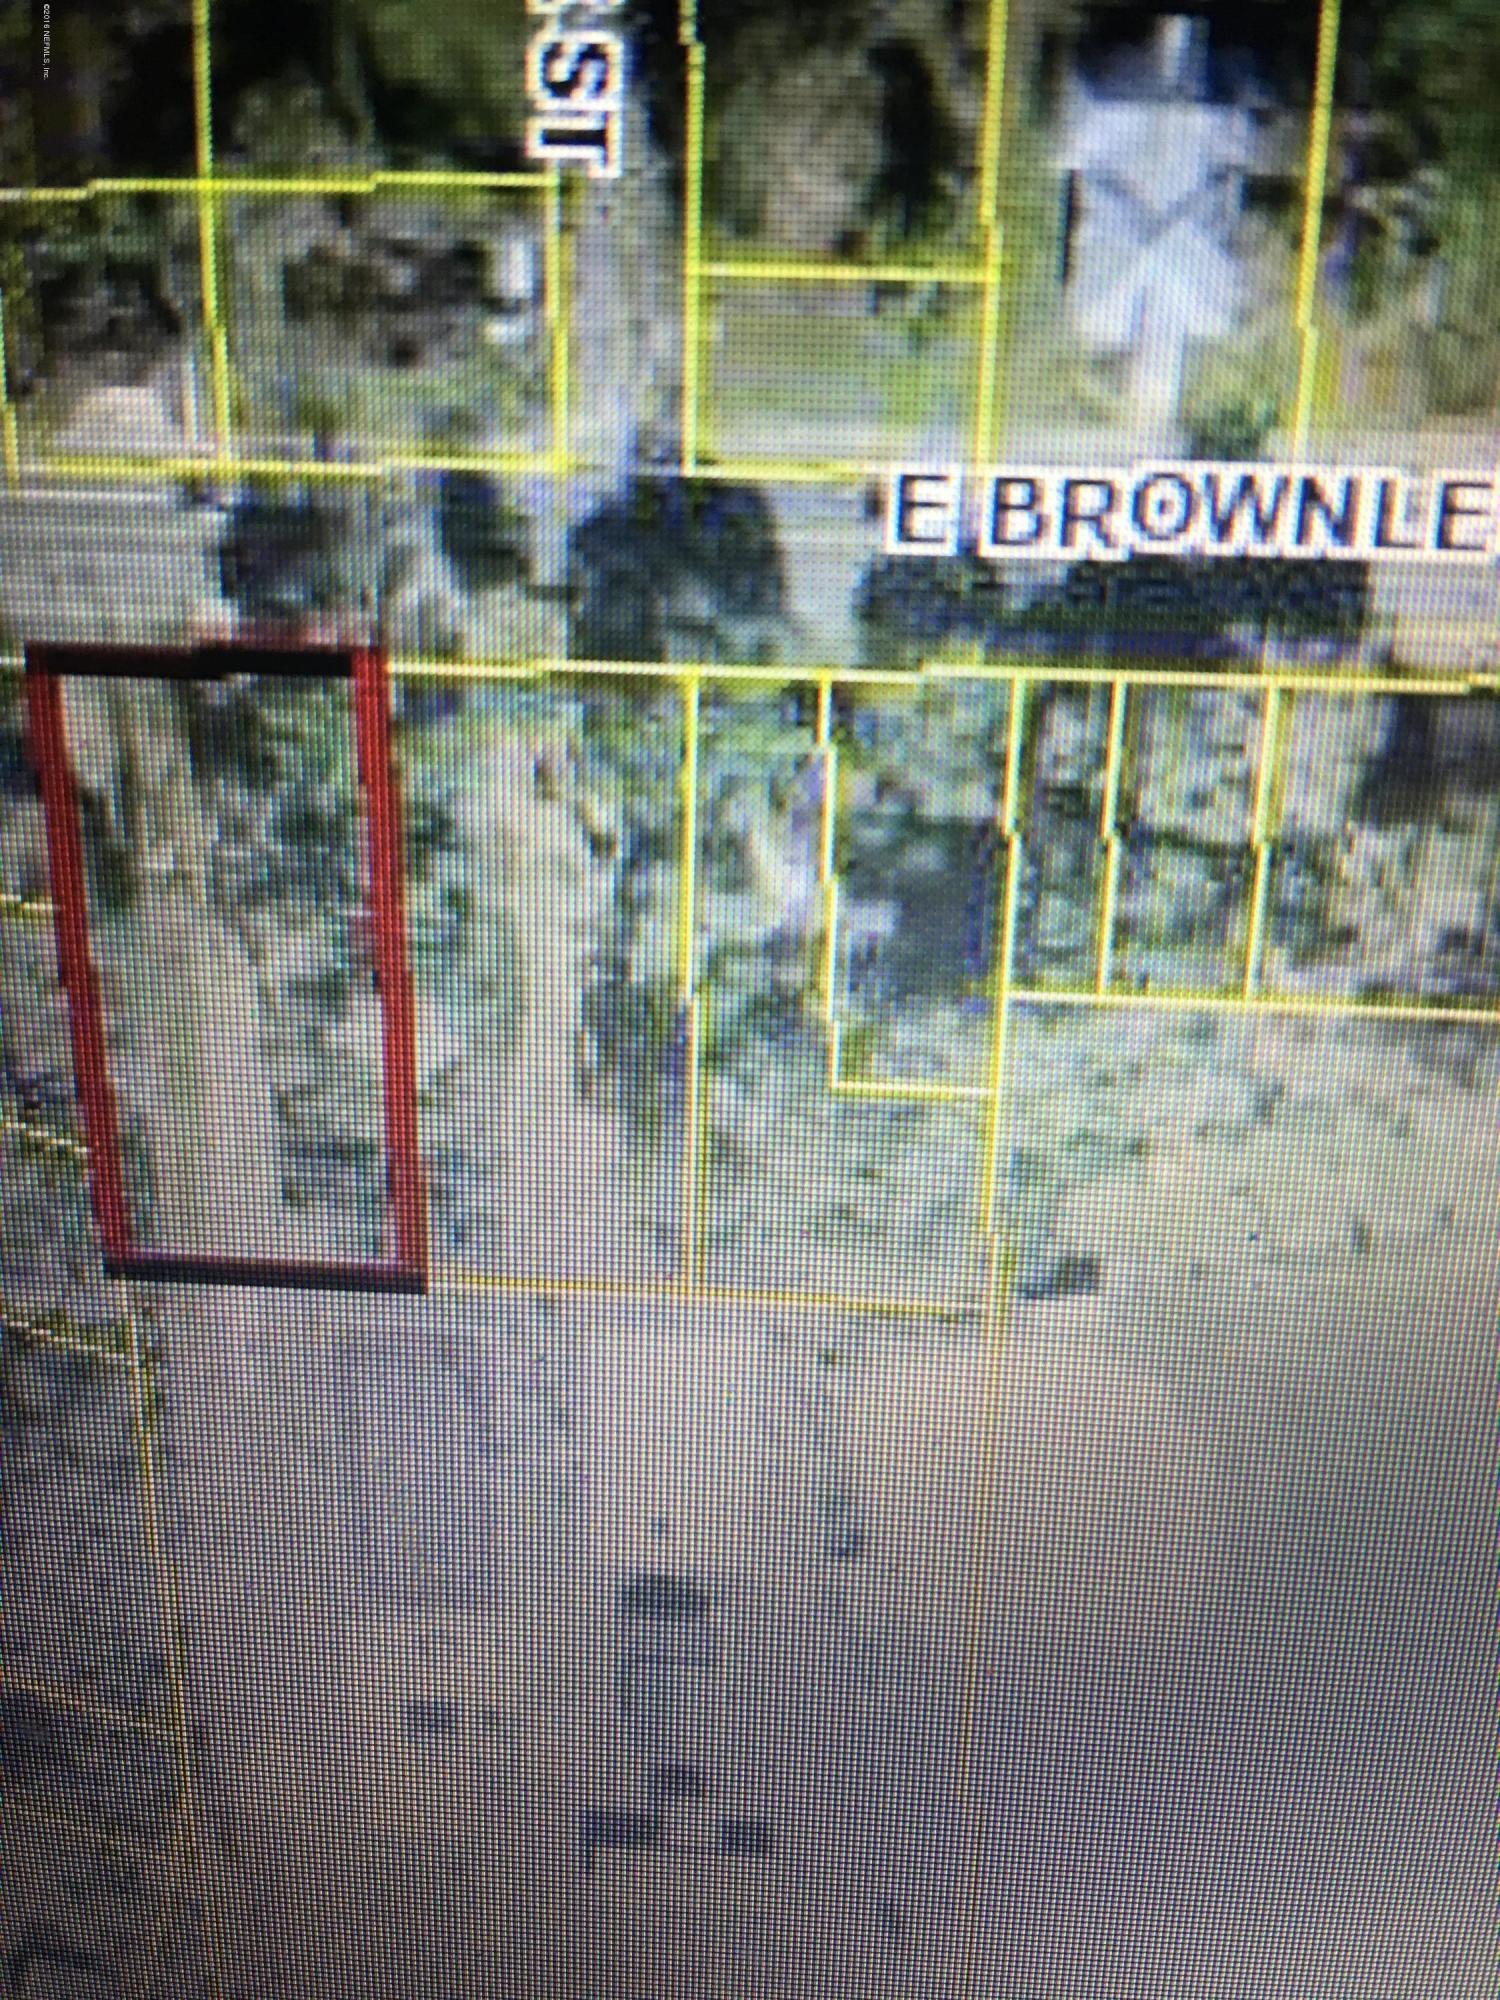 0 BROWNLEE, STARKE, FLORIDA 32091, ,Vacant land,For sale,BROWNLEE,856445